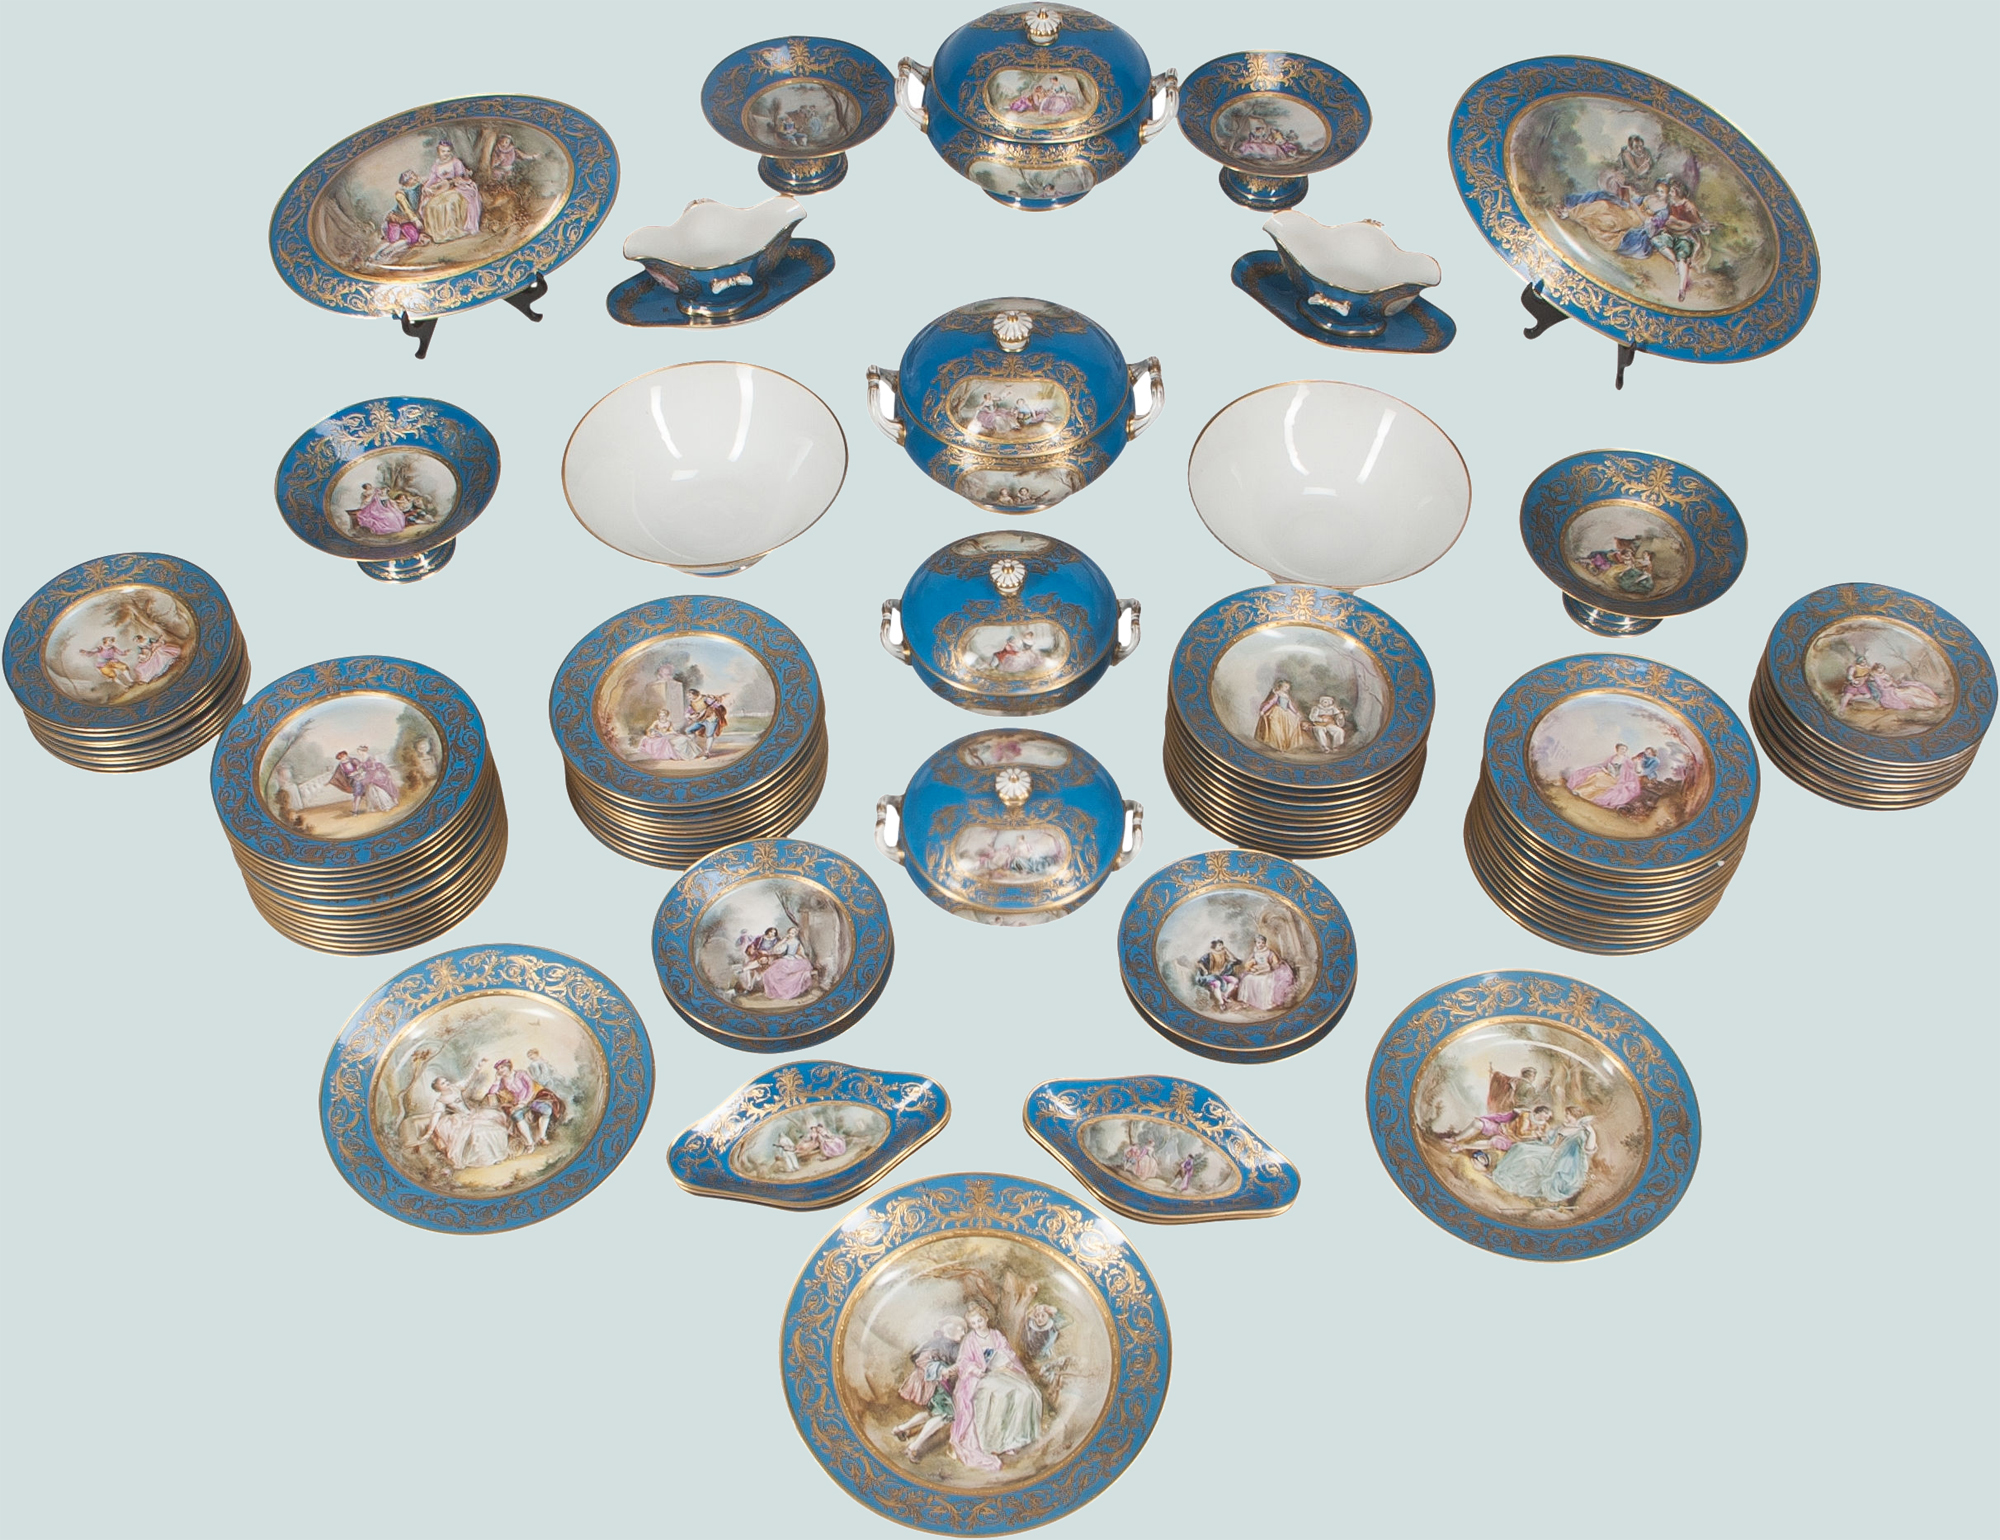 Some of the 96-piece Sèvres-style porcelain service (est. $30,000+). Heritage Auctions image